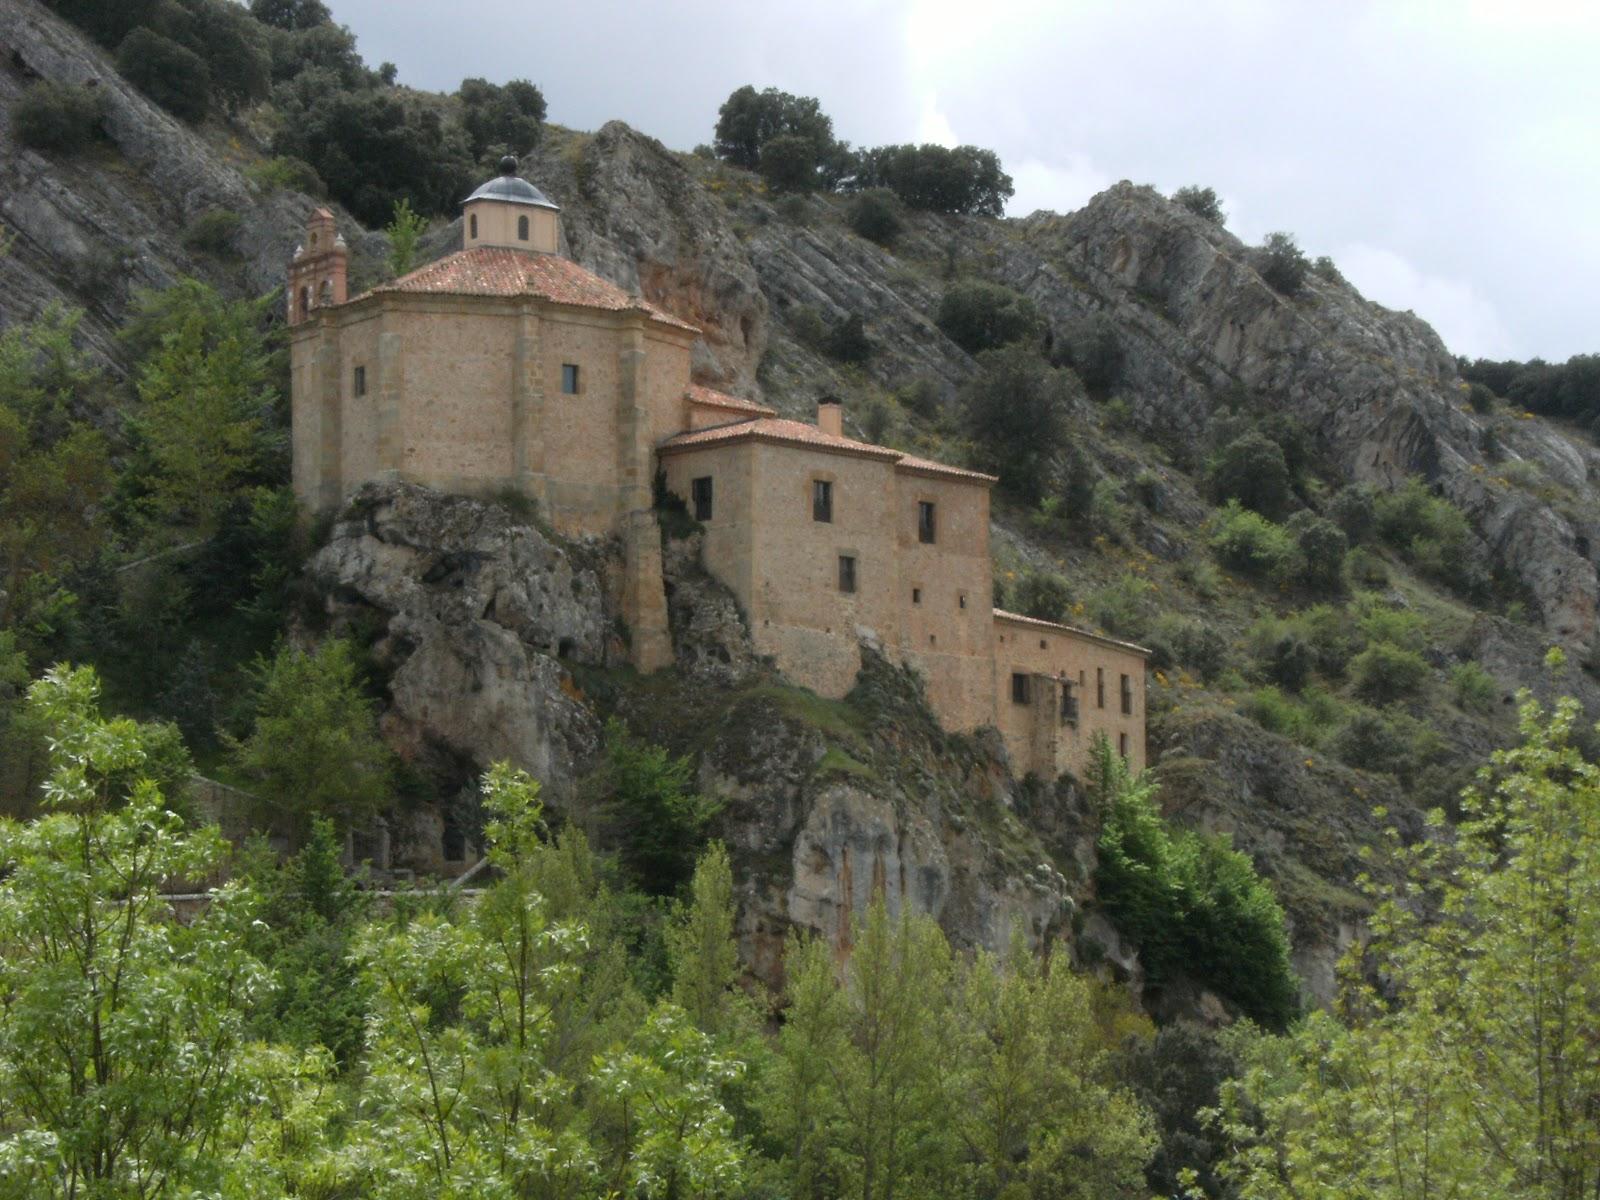 Buscando Montsalvatge: SORIA. Ermita de San Saturio